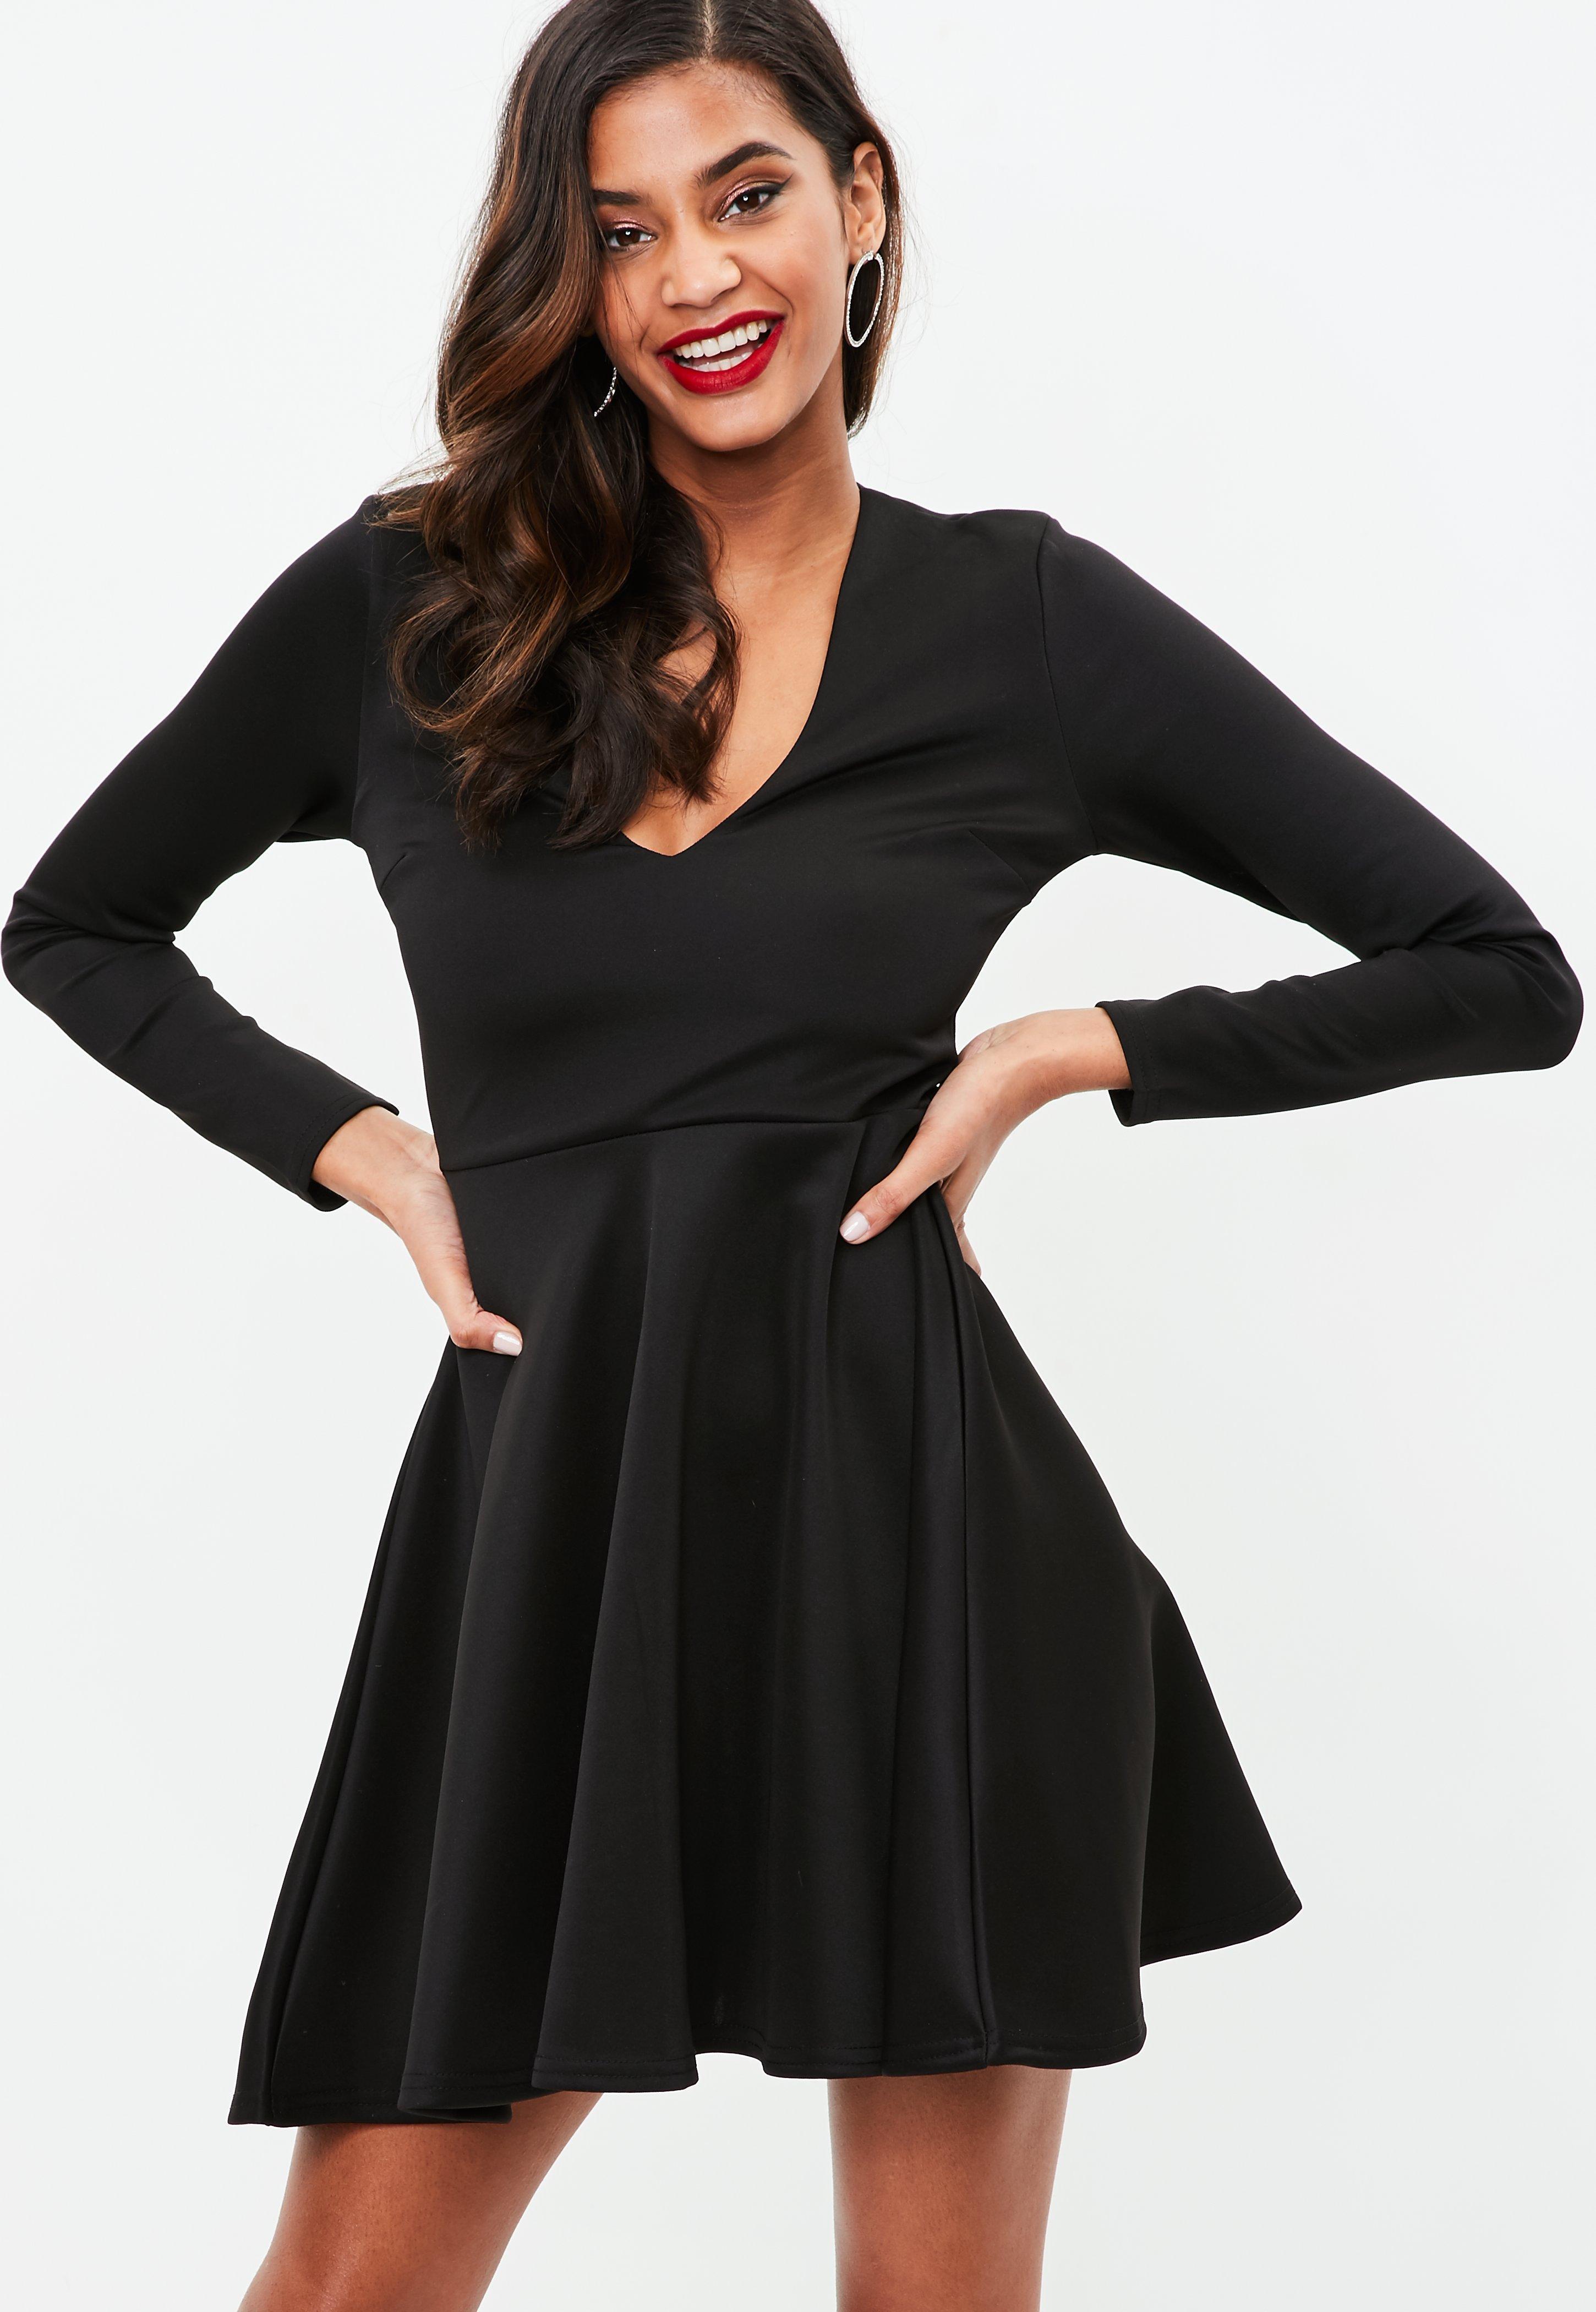 41556a747426 Lyst - Missguided Black Scuba Plunge Skater Dress in Black